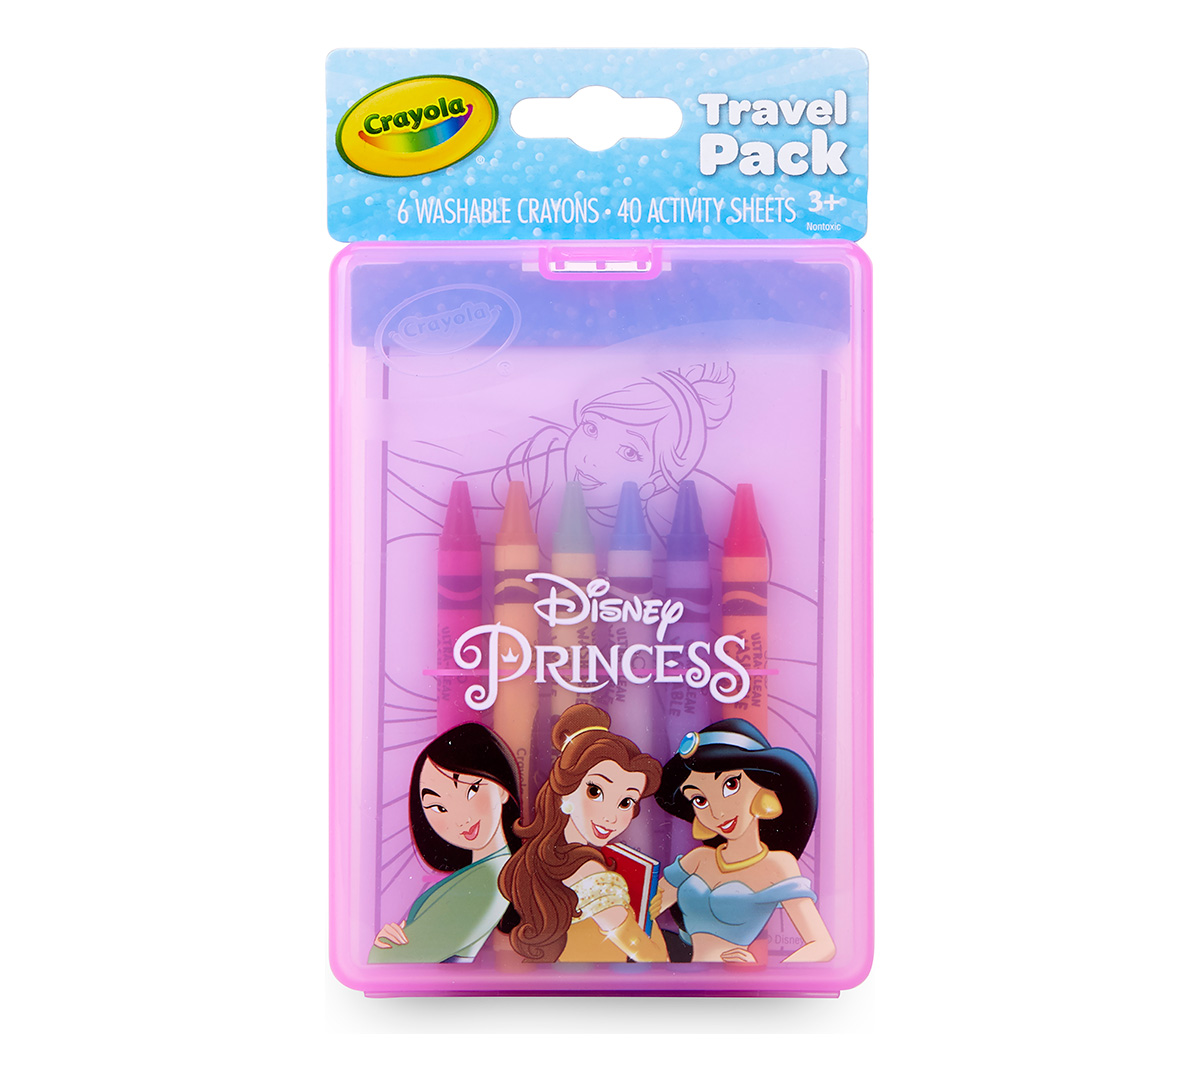 Princess Travel Pack